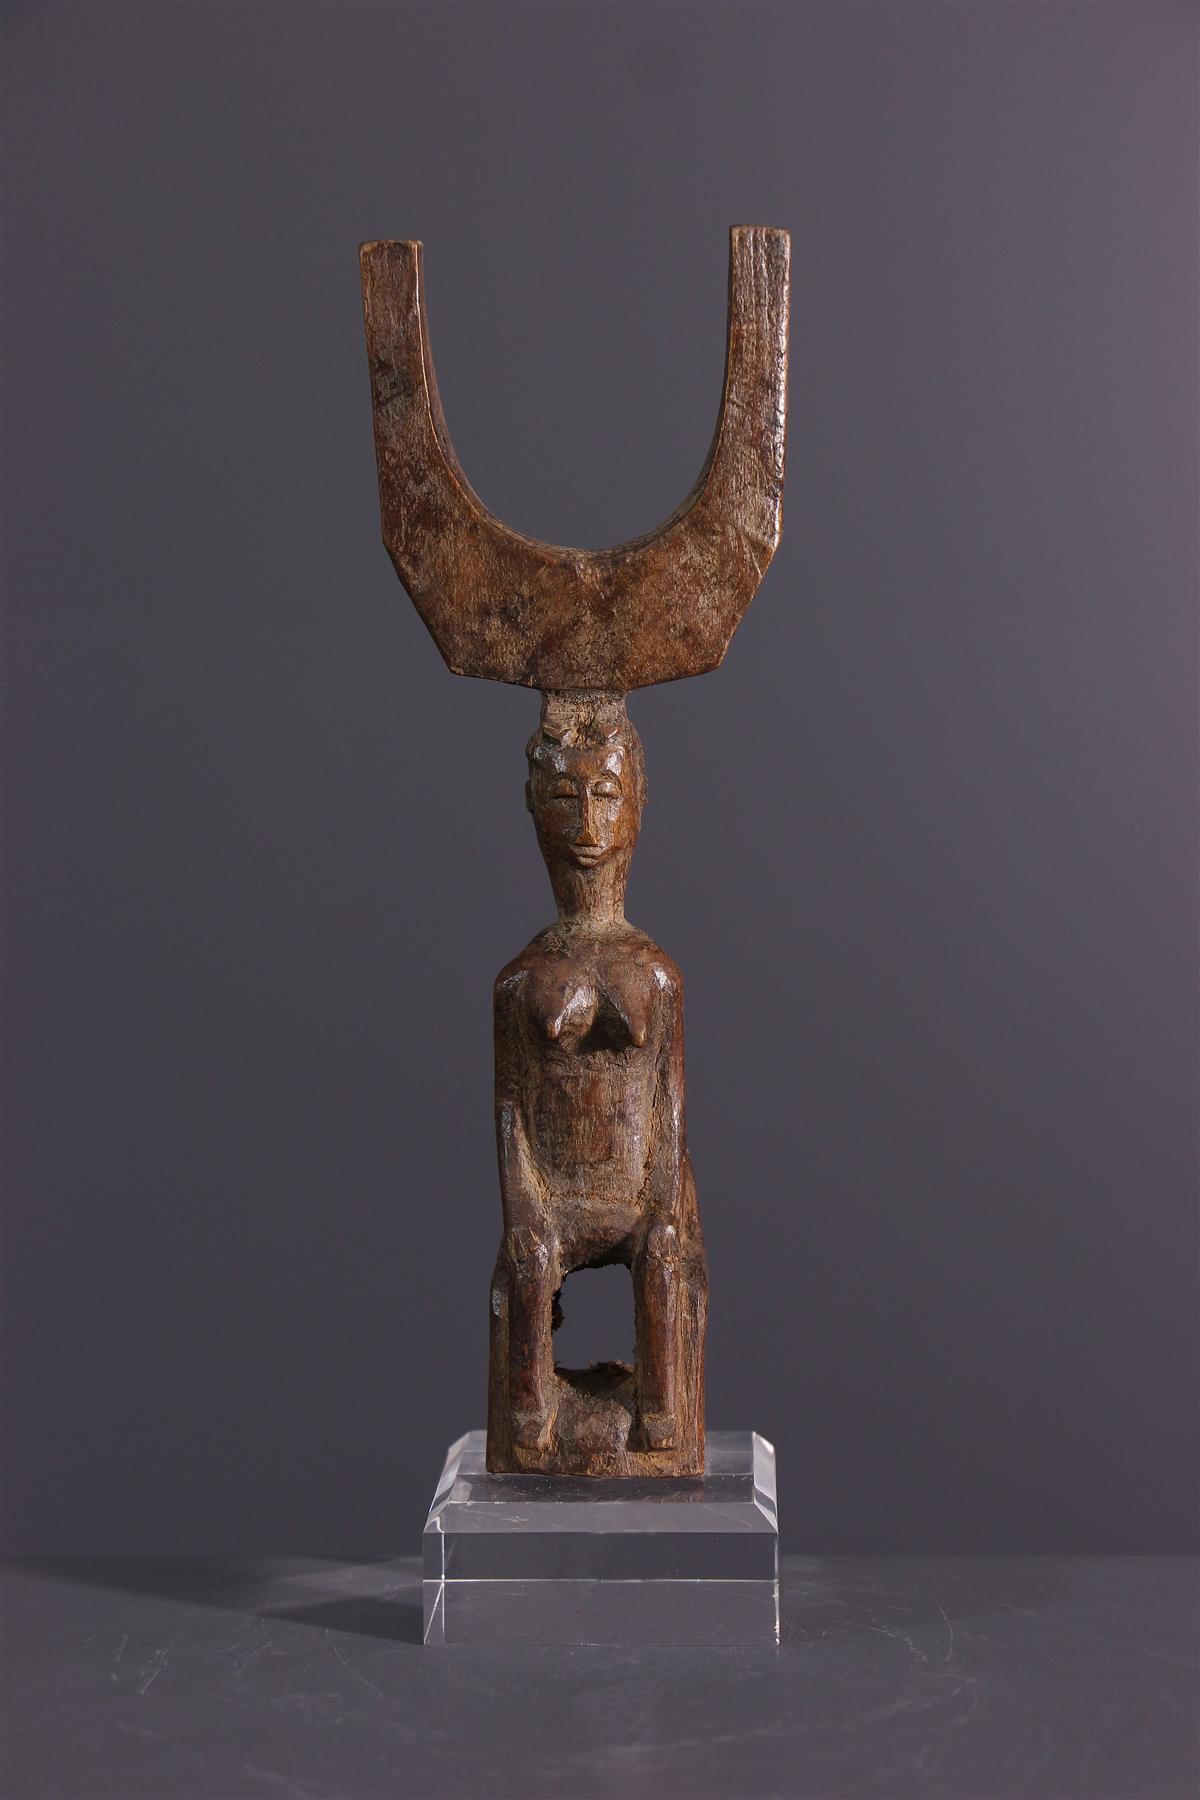 Baoule Sling - African art